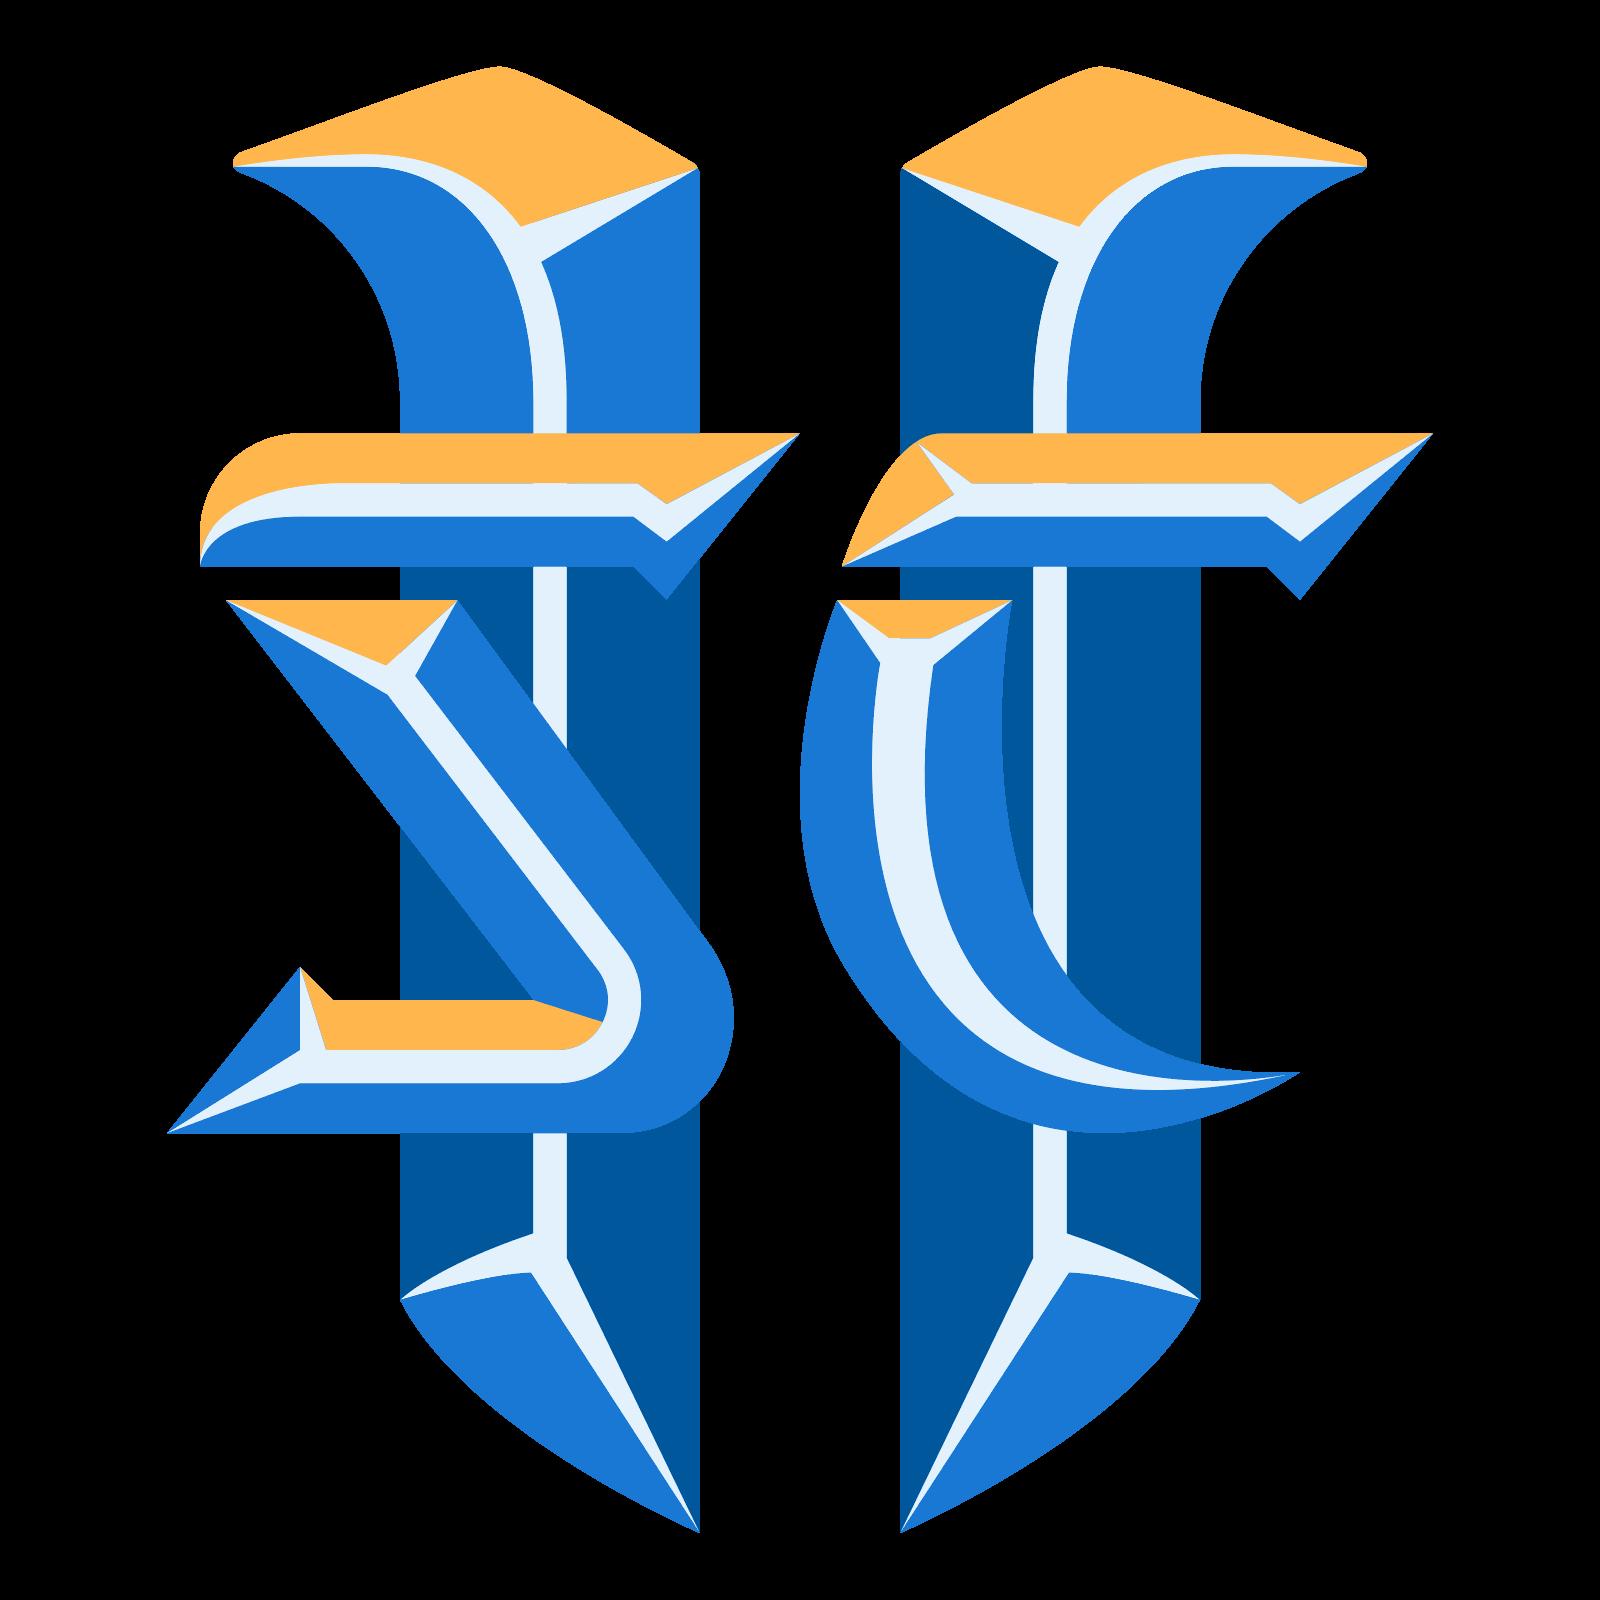 Starcraft 2 logo PNG